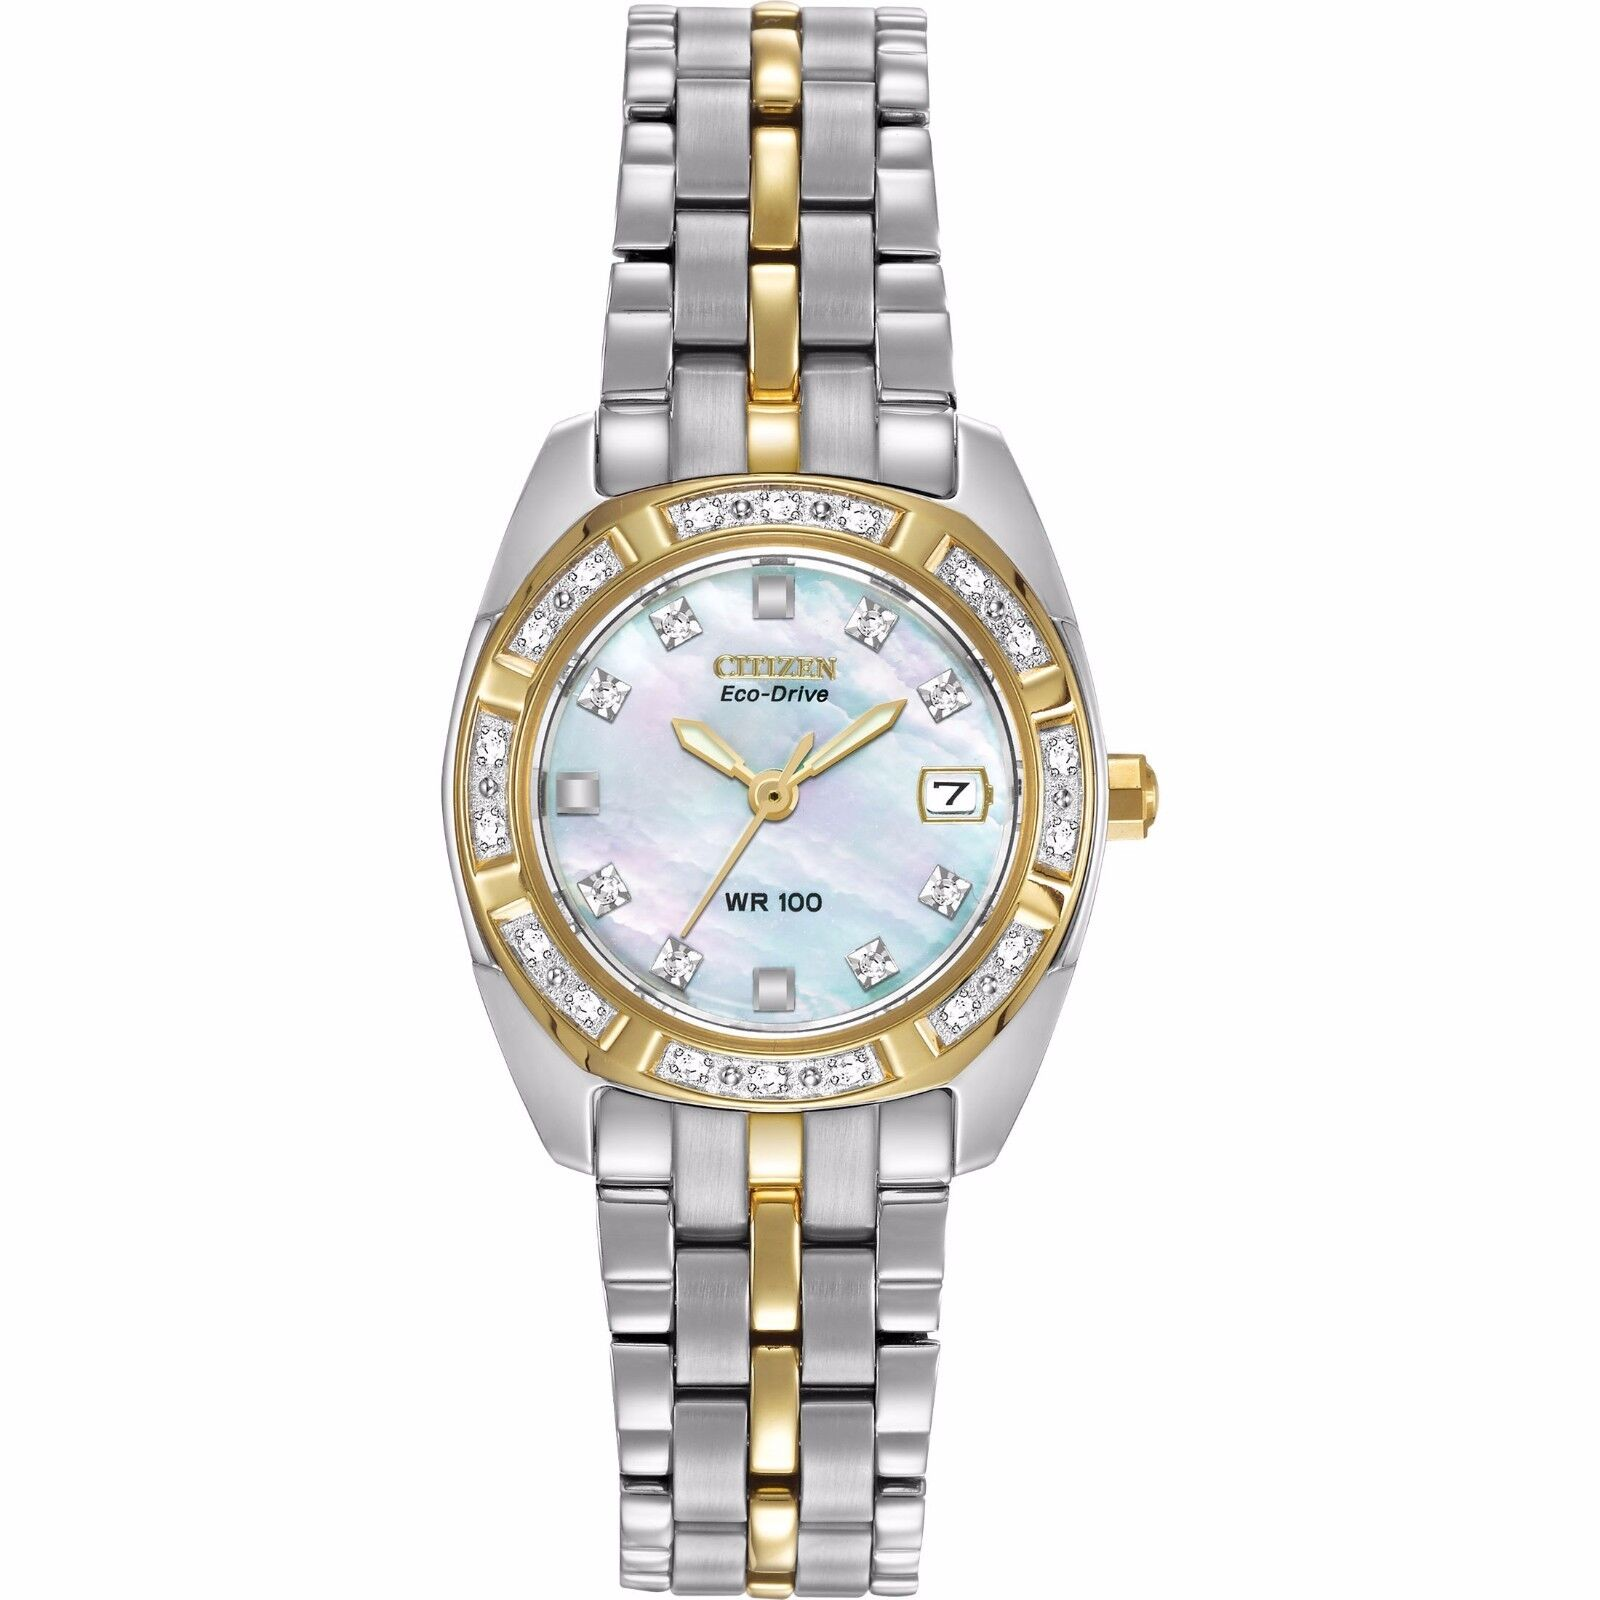 $129.99 - Citizen Eco-Drive Women's EW1594-55D Paladion Diamond Bezel and Markers Watch